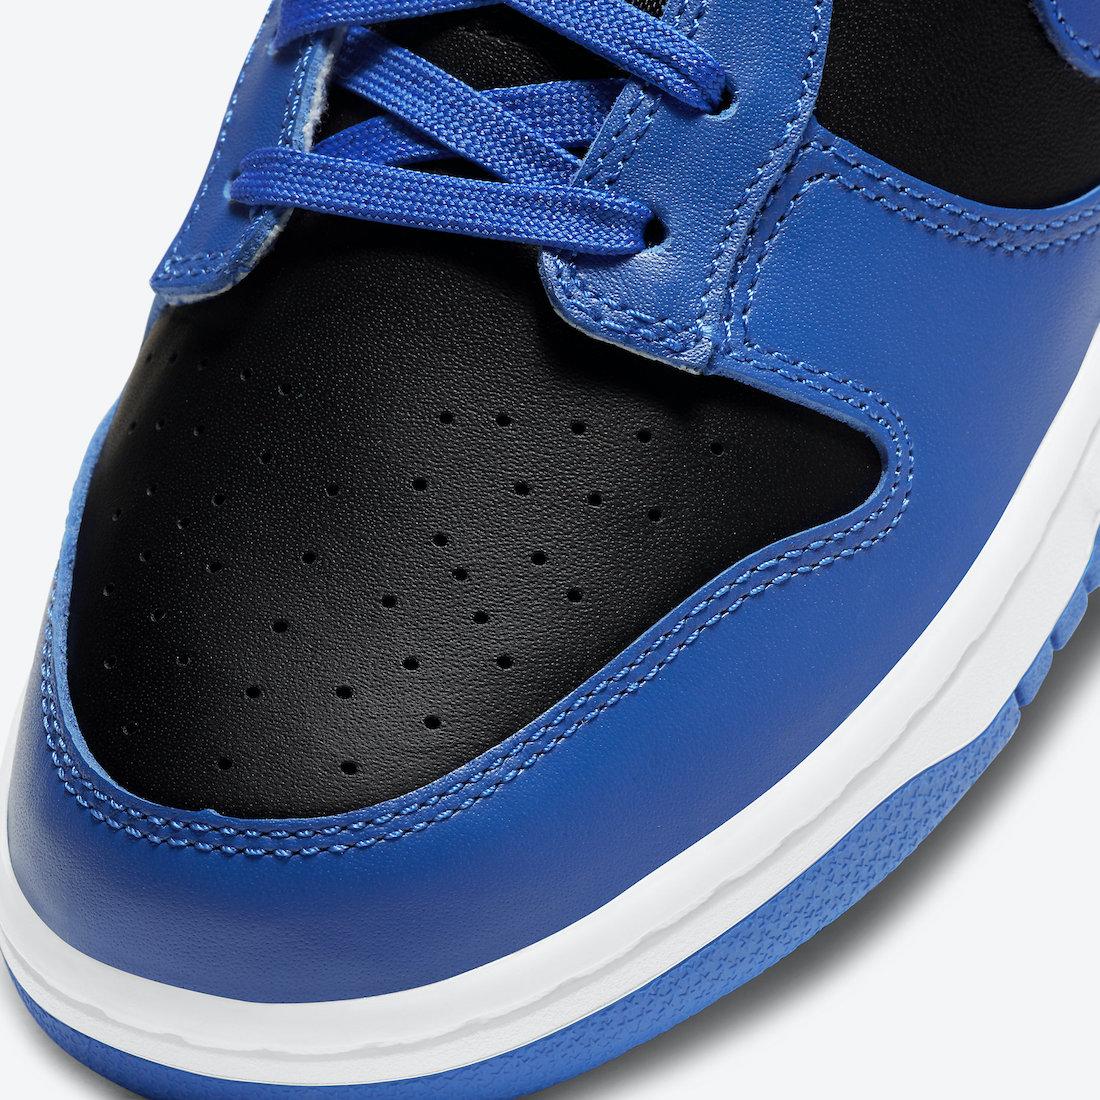 Nike-Dunk-Low-Hyper-Cobalt-DD1391-001-Release-Date-Price-6